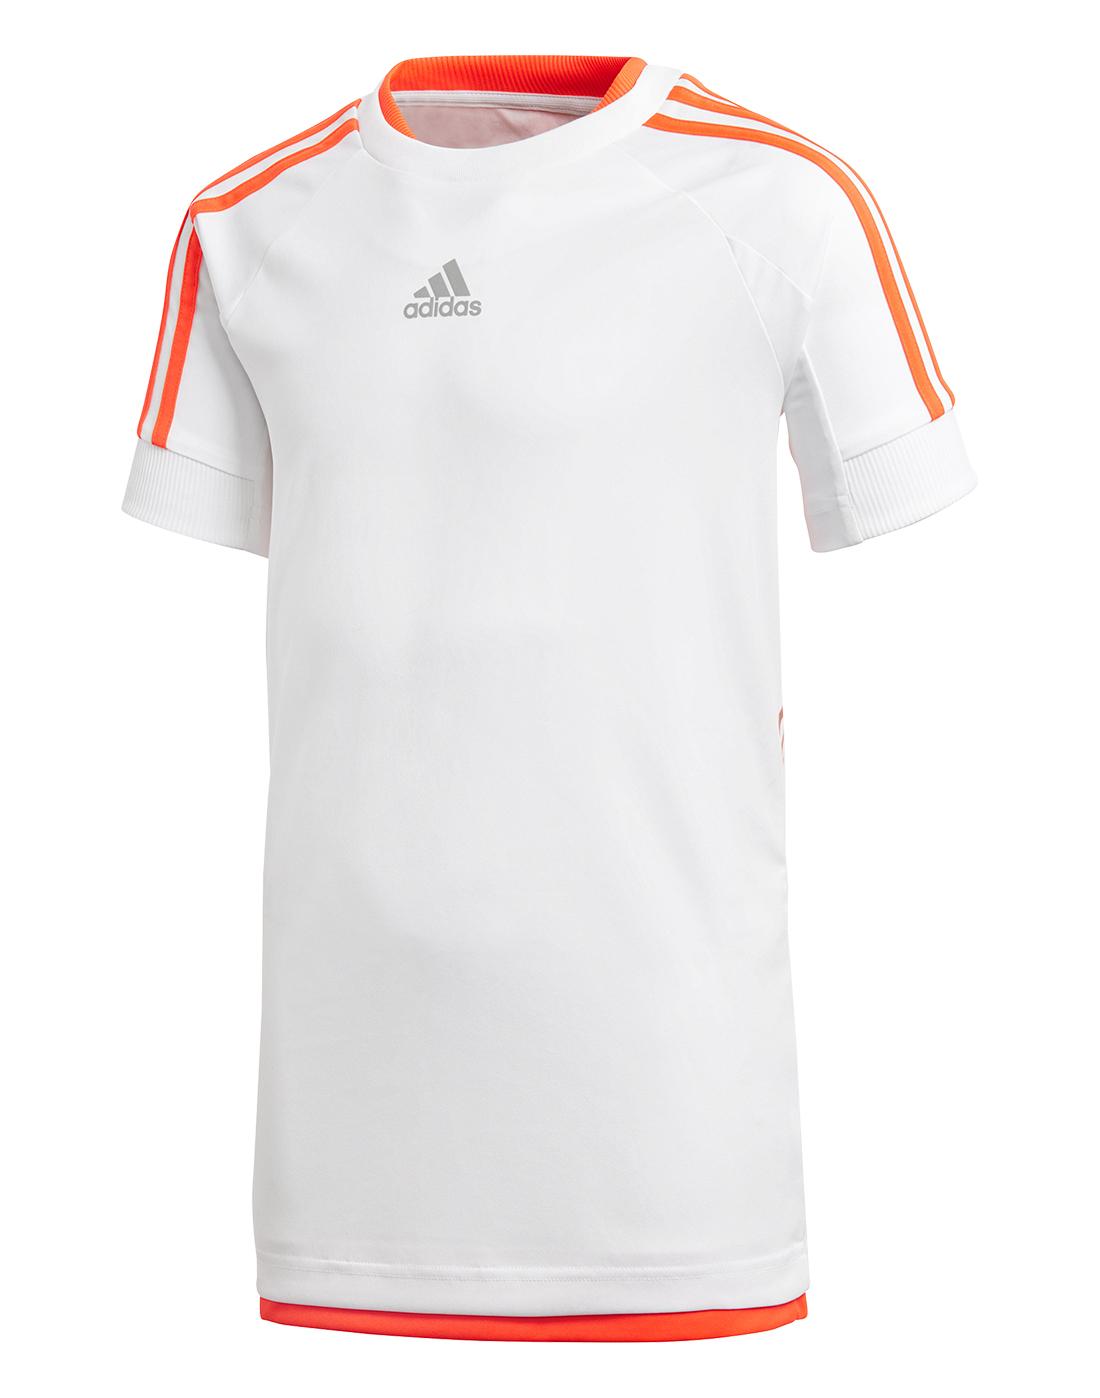 8fe3c5cea580 Kid's White & Orange adidas Predator T-Shirt | Life Style Sports